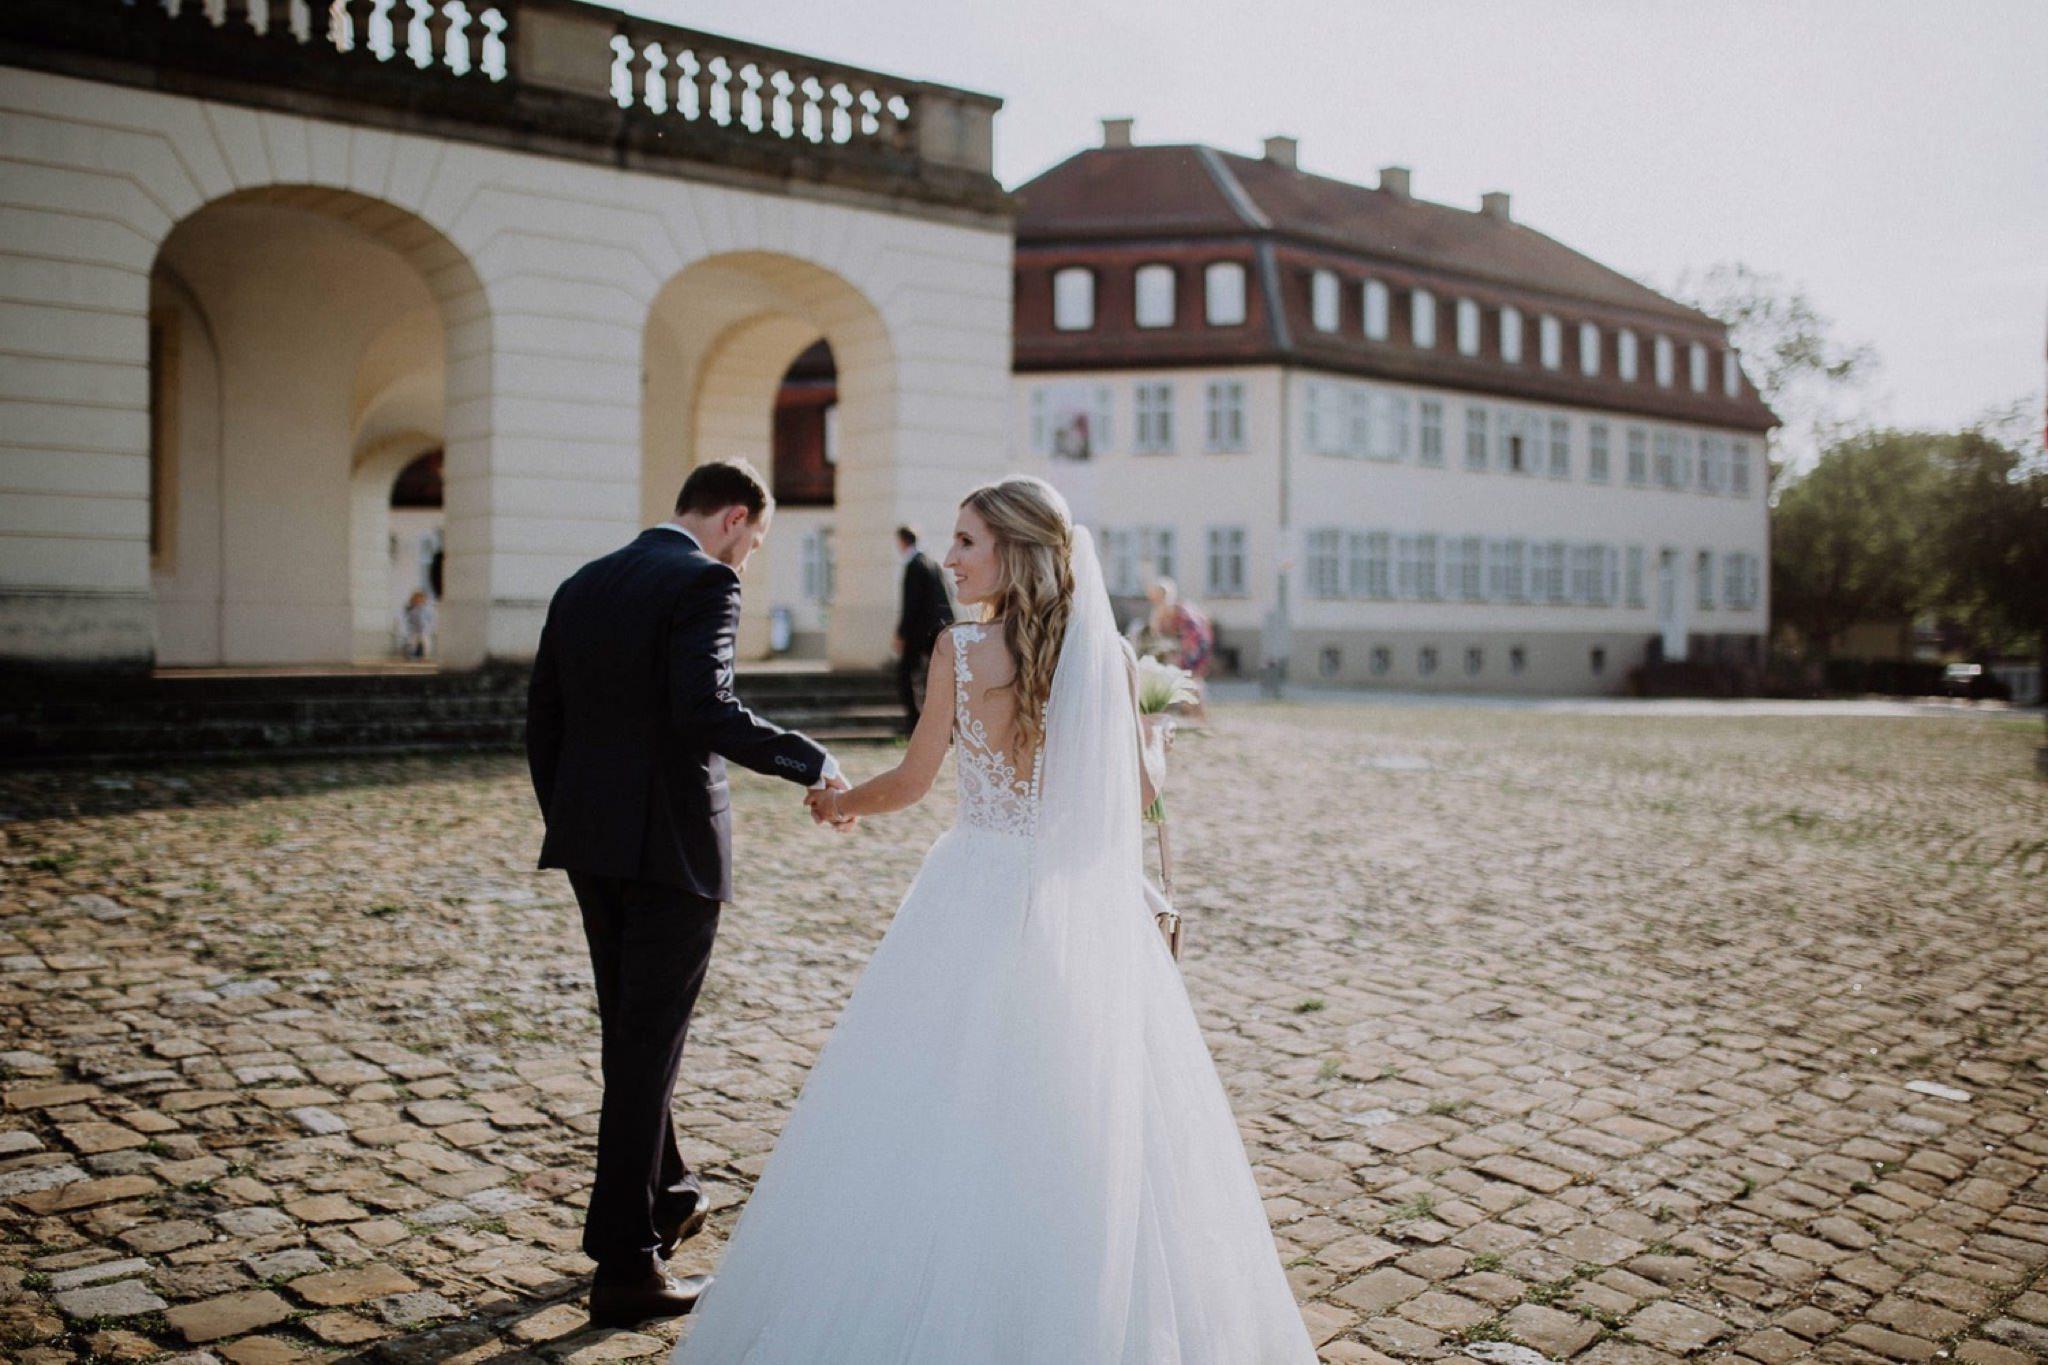 wedding photographer hamilton new zealand 1050